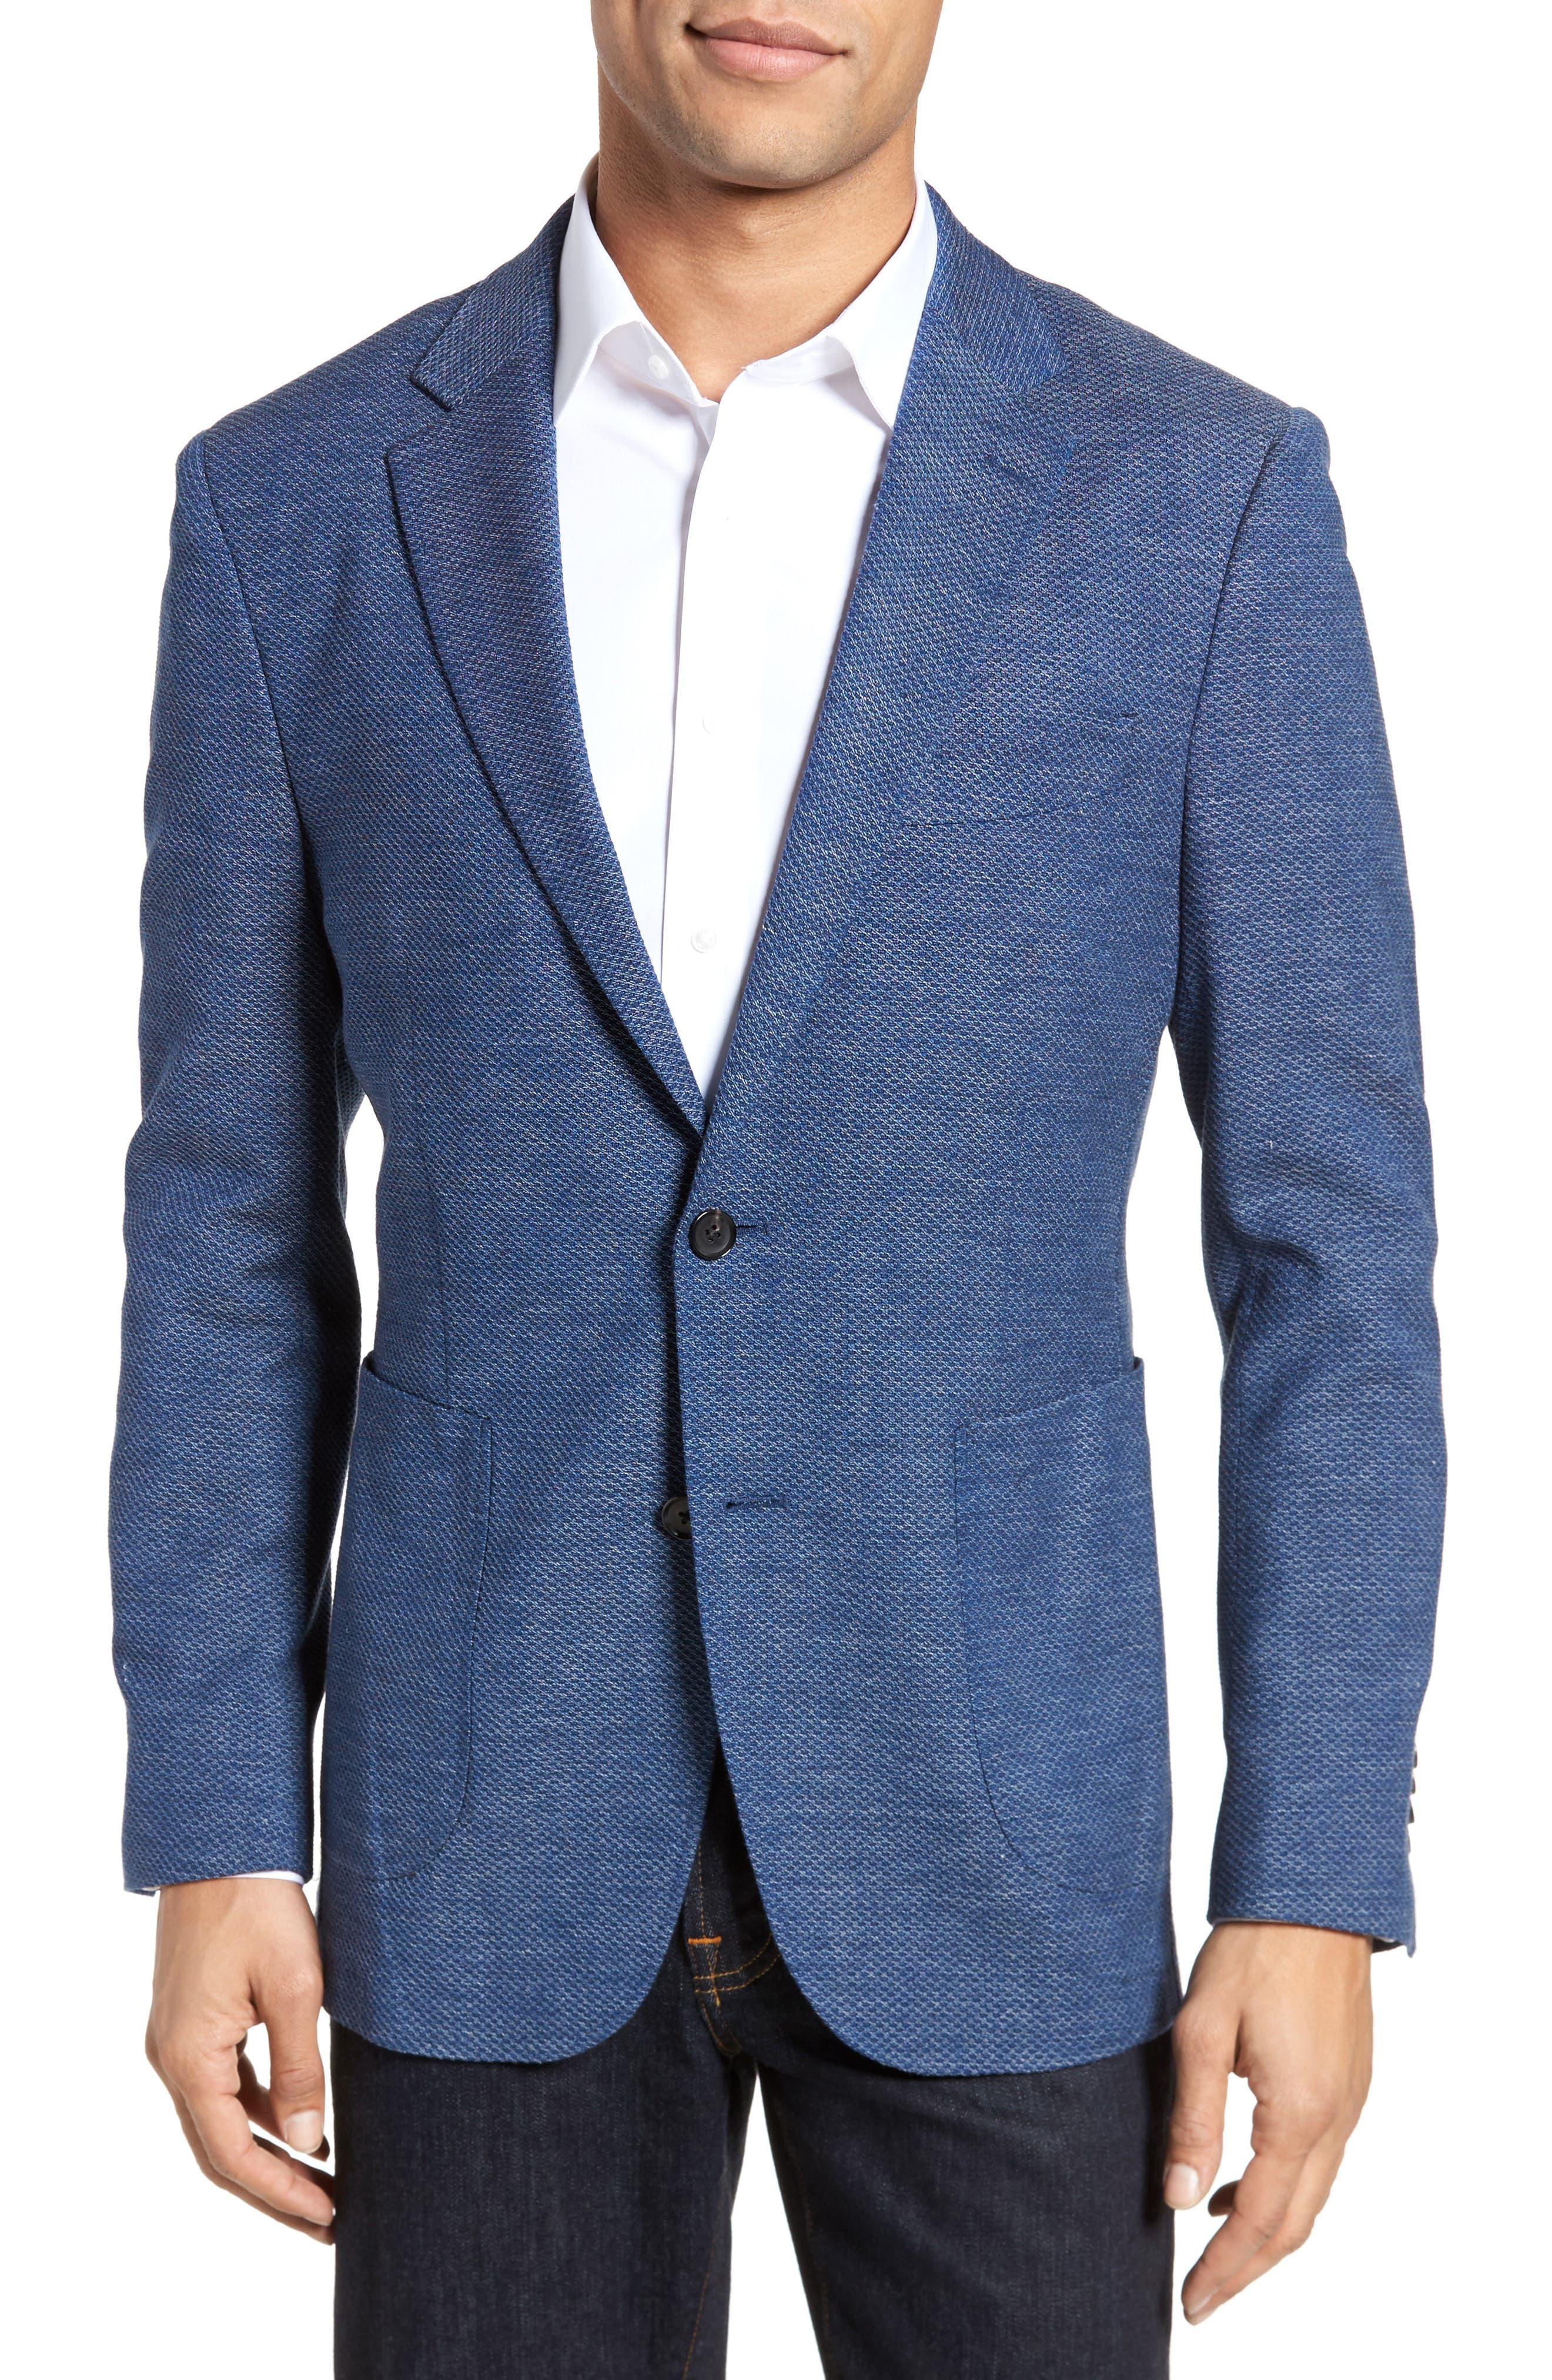 Fife Street Wool Blend Blazer,                             Main thumbnail 1, color,                             Marine